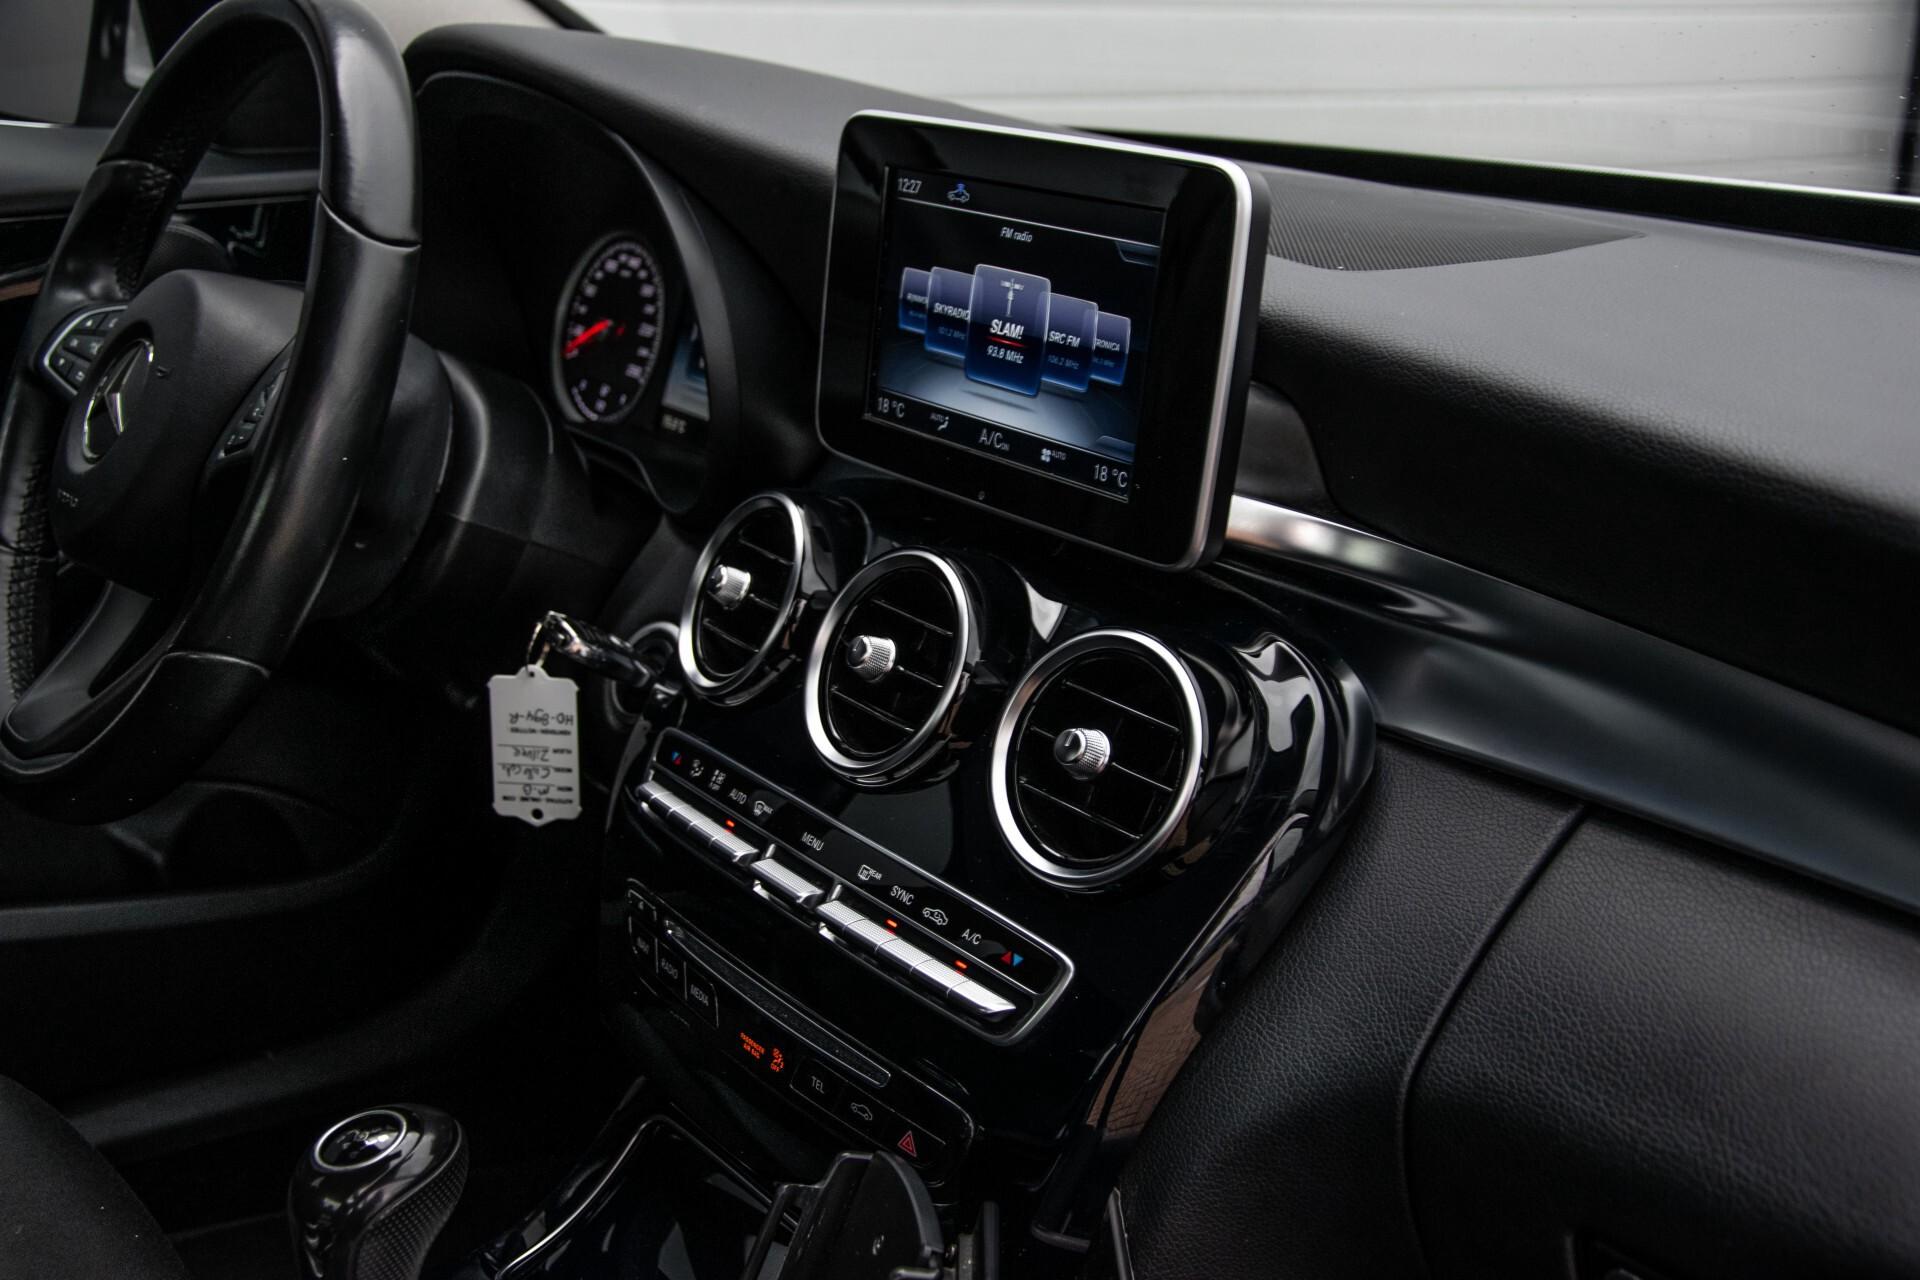 Mercedes-Benz C-Klasse 180 Bluetec Lease Edition Intelligent Light System/Cruise Control/Navi Foto 38